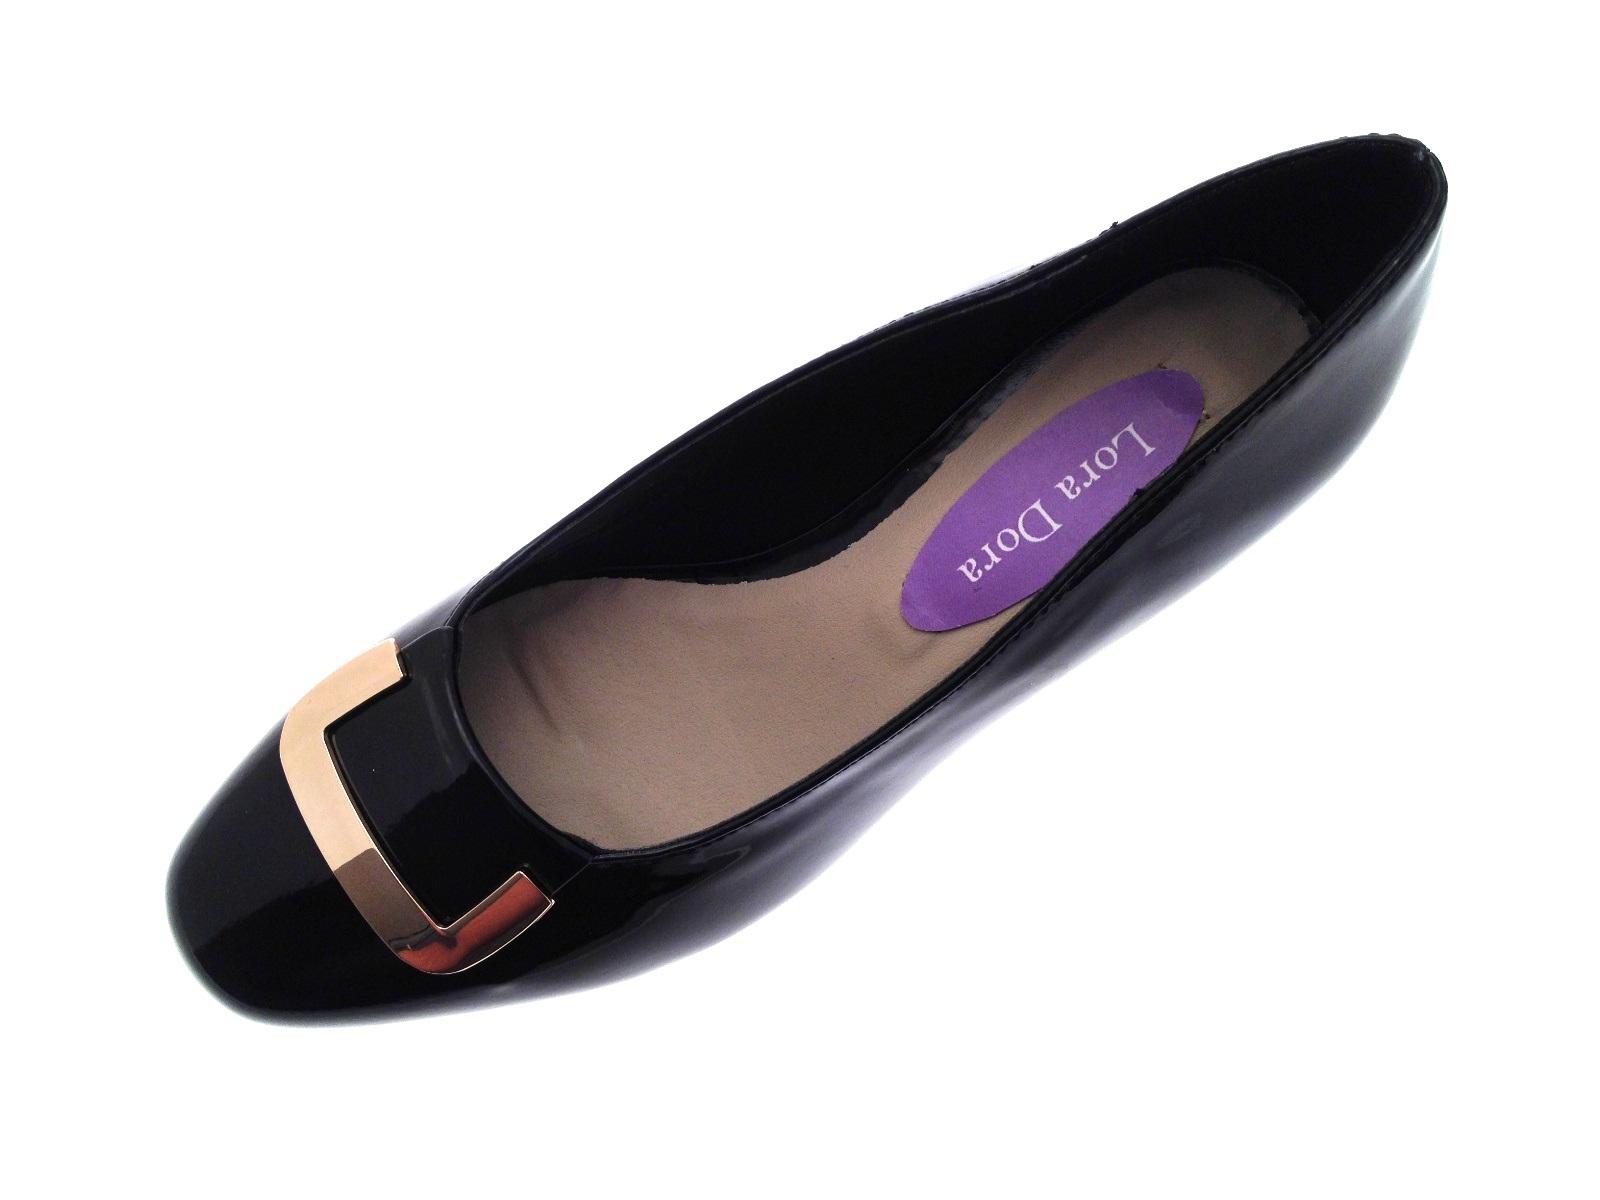 cf47ec6cc4cf Womens Patent Low Block Heels Wide Fit Comfort Court Shoes Ladies ...